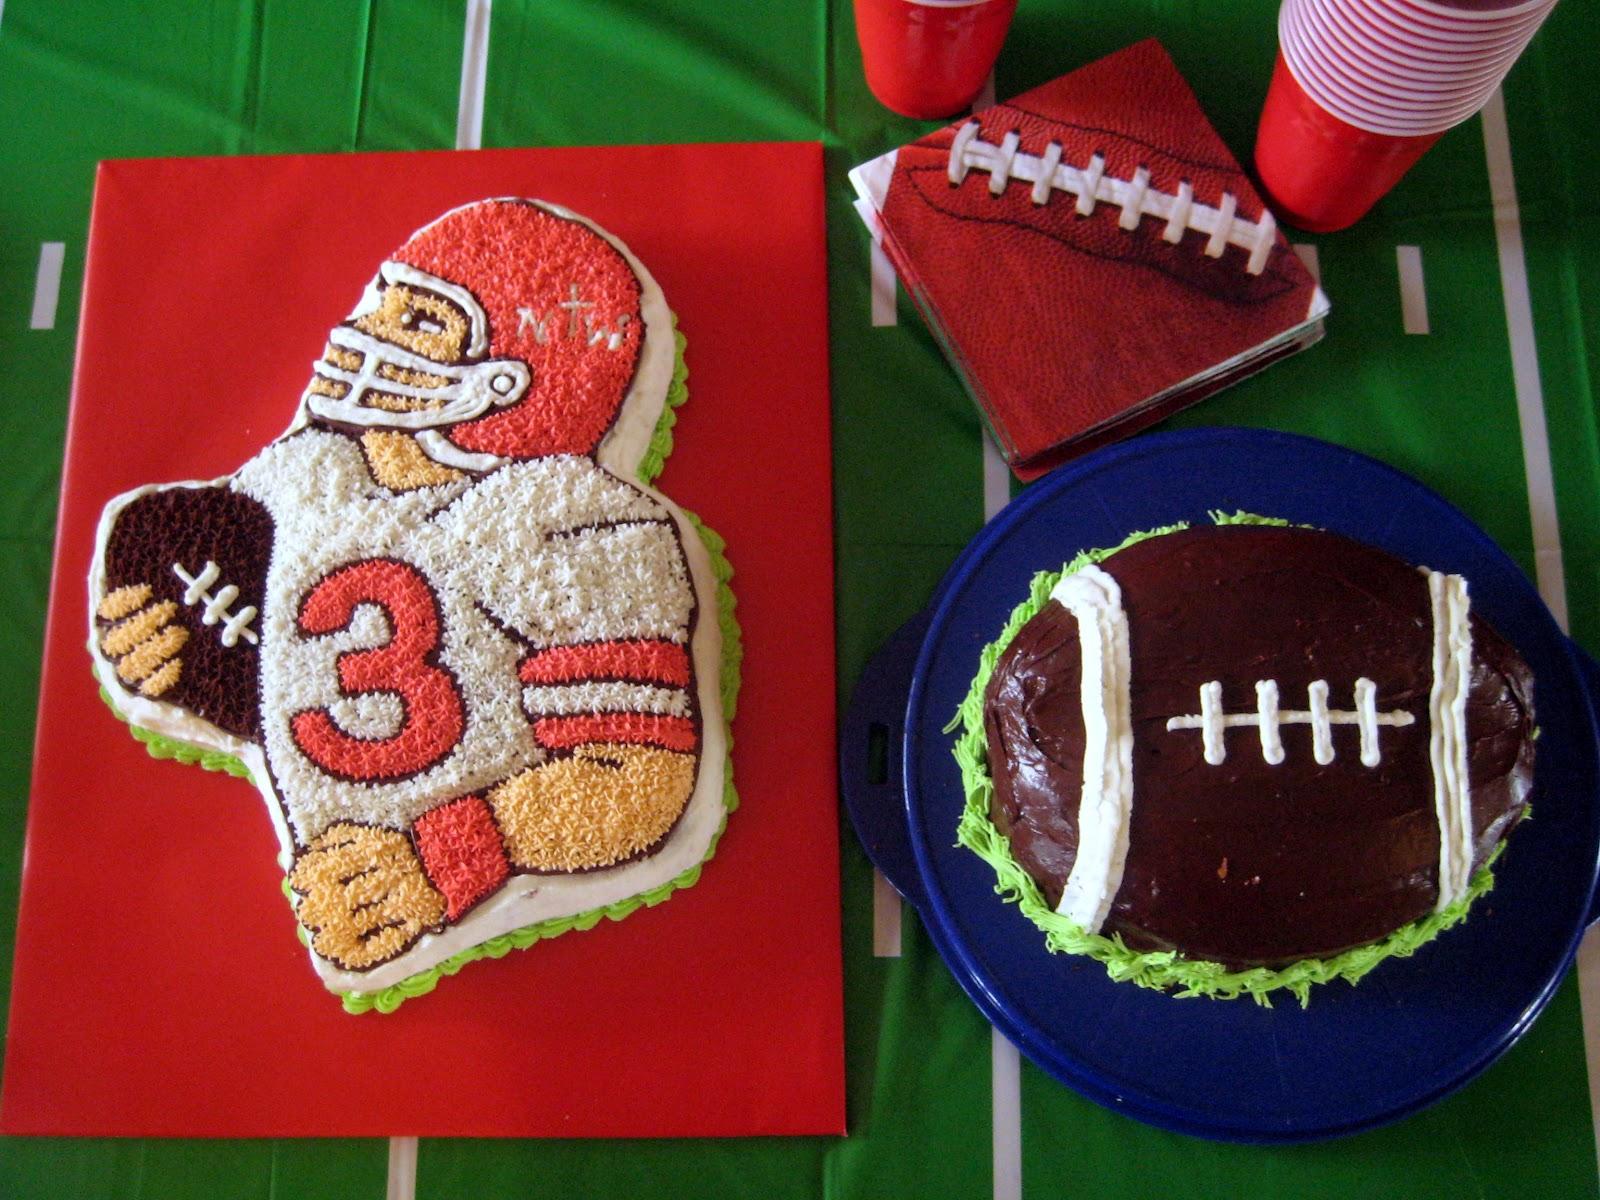 COBO Football Cakes